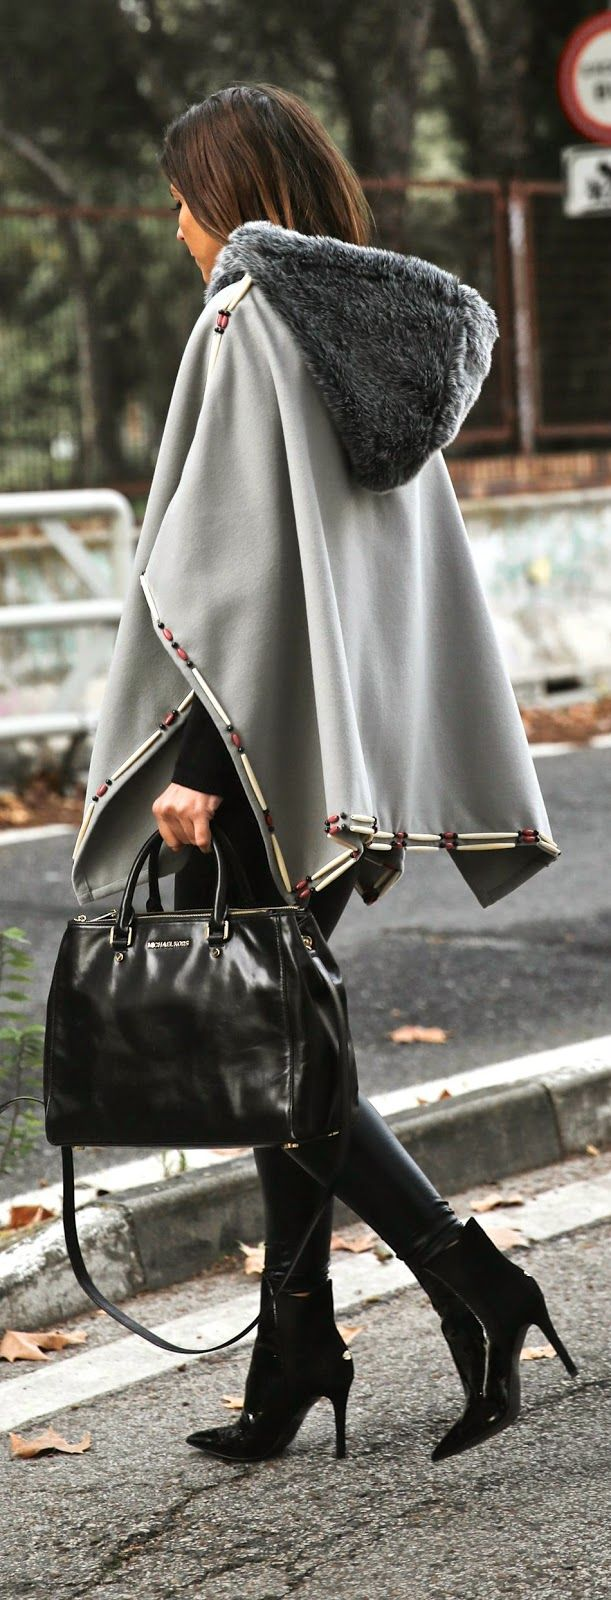 Grey Cape with Black Leather Skinnies - TrendyTaste